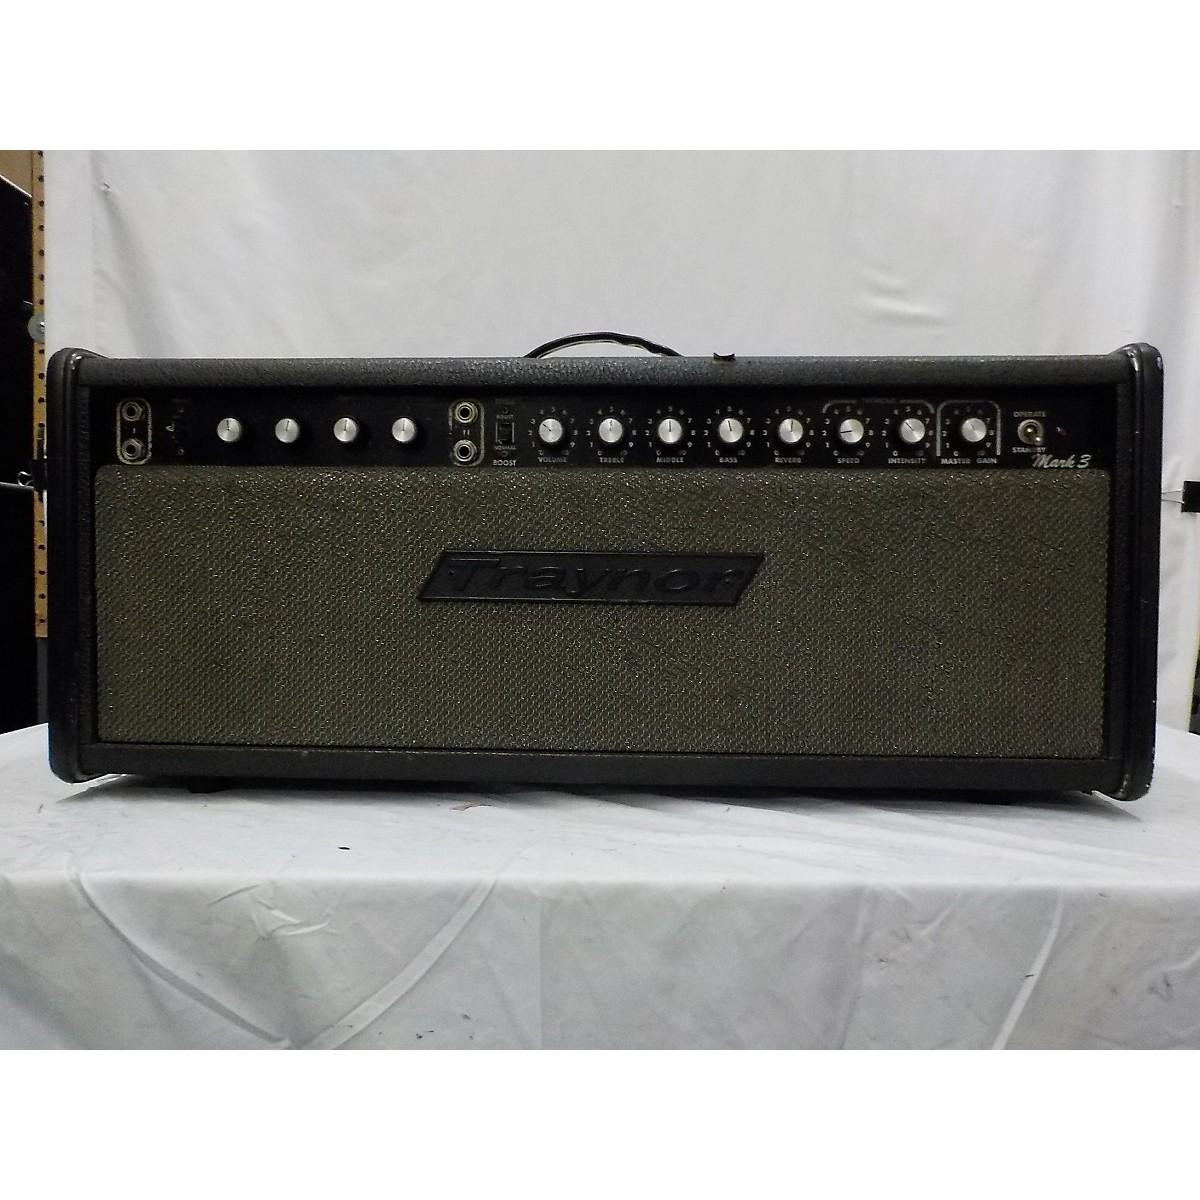 Traynor 1970s Mark 3 Tube Guitar Amp Head